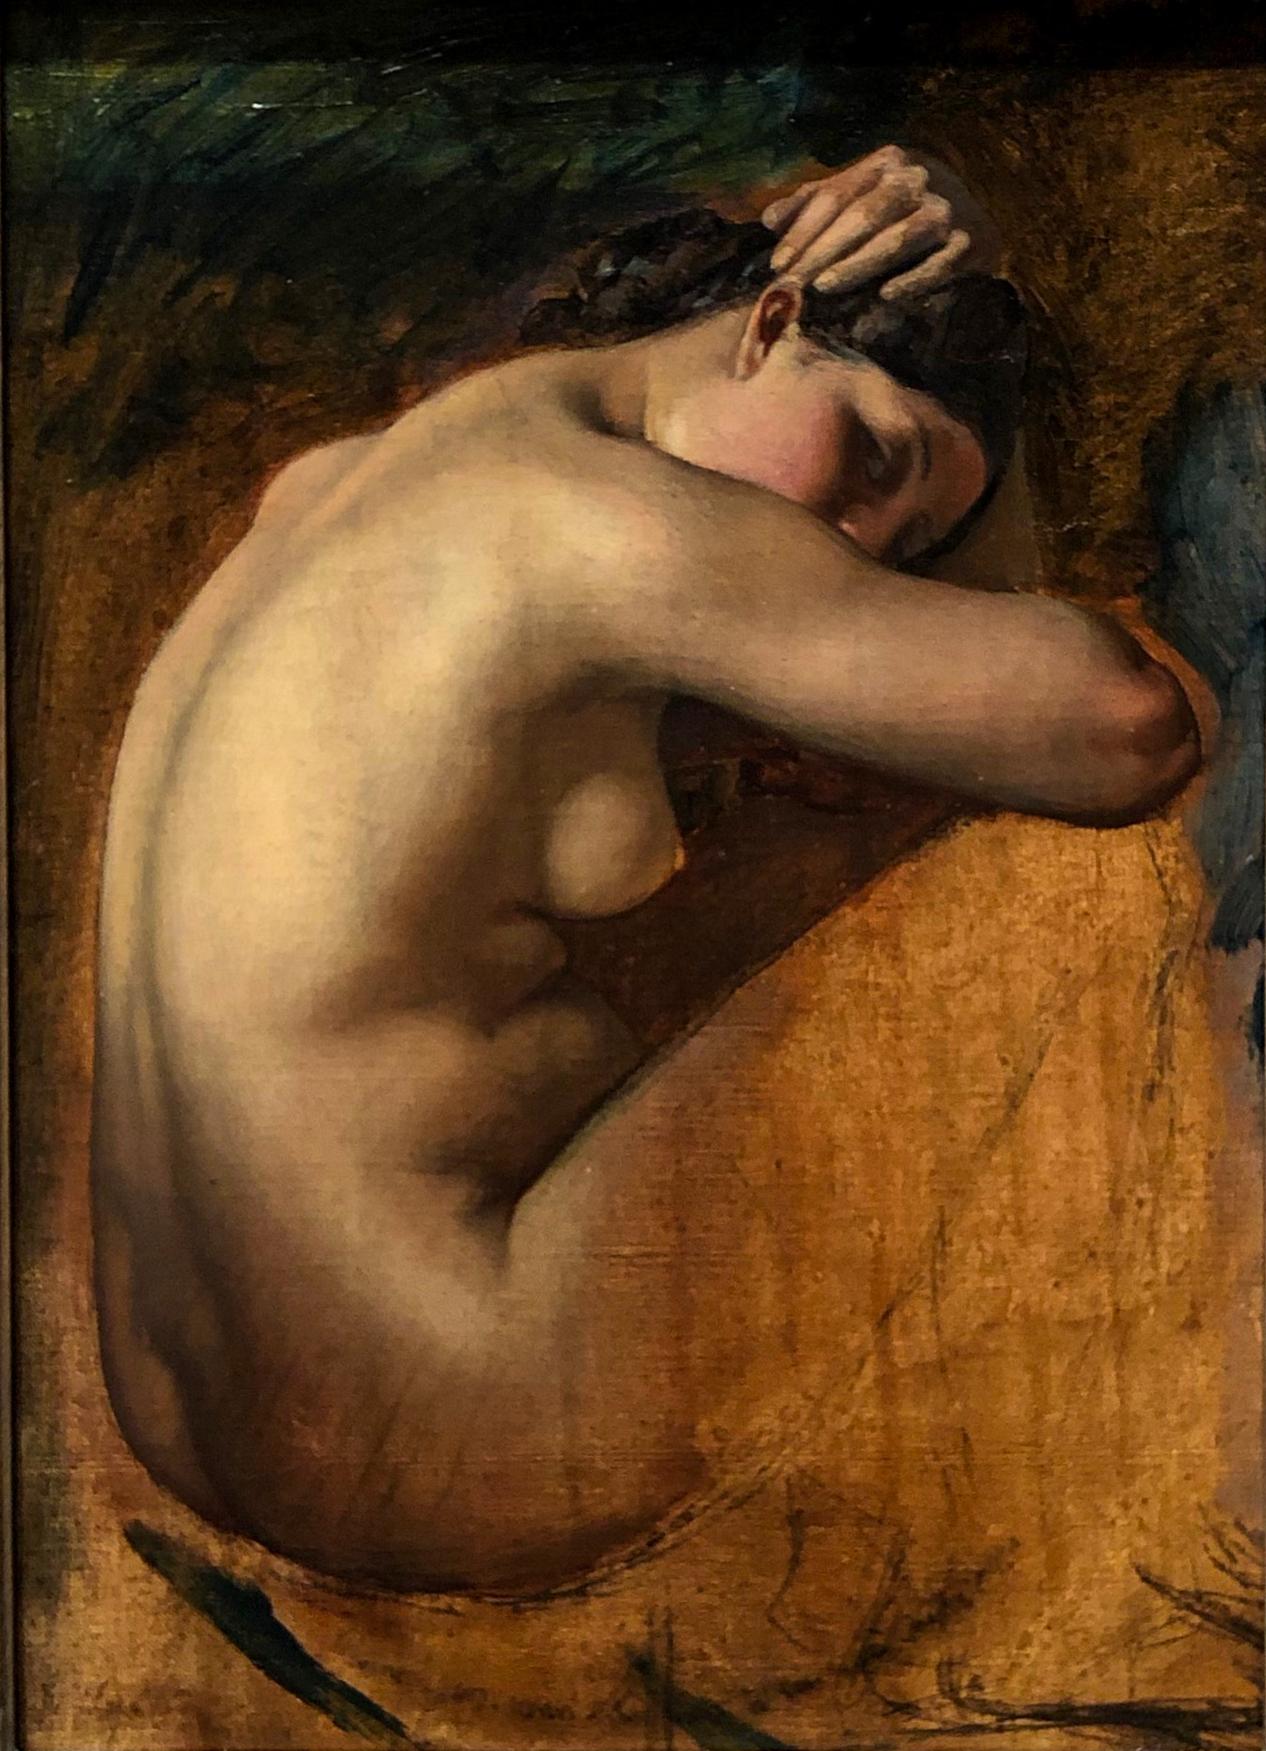 @ Female Nude, Study of_Henri Lehmann : (1840).jpg